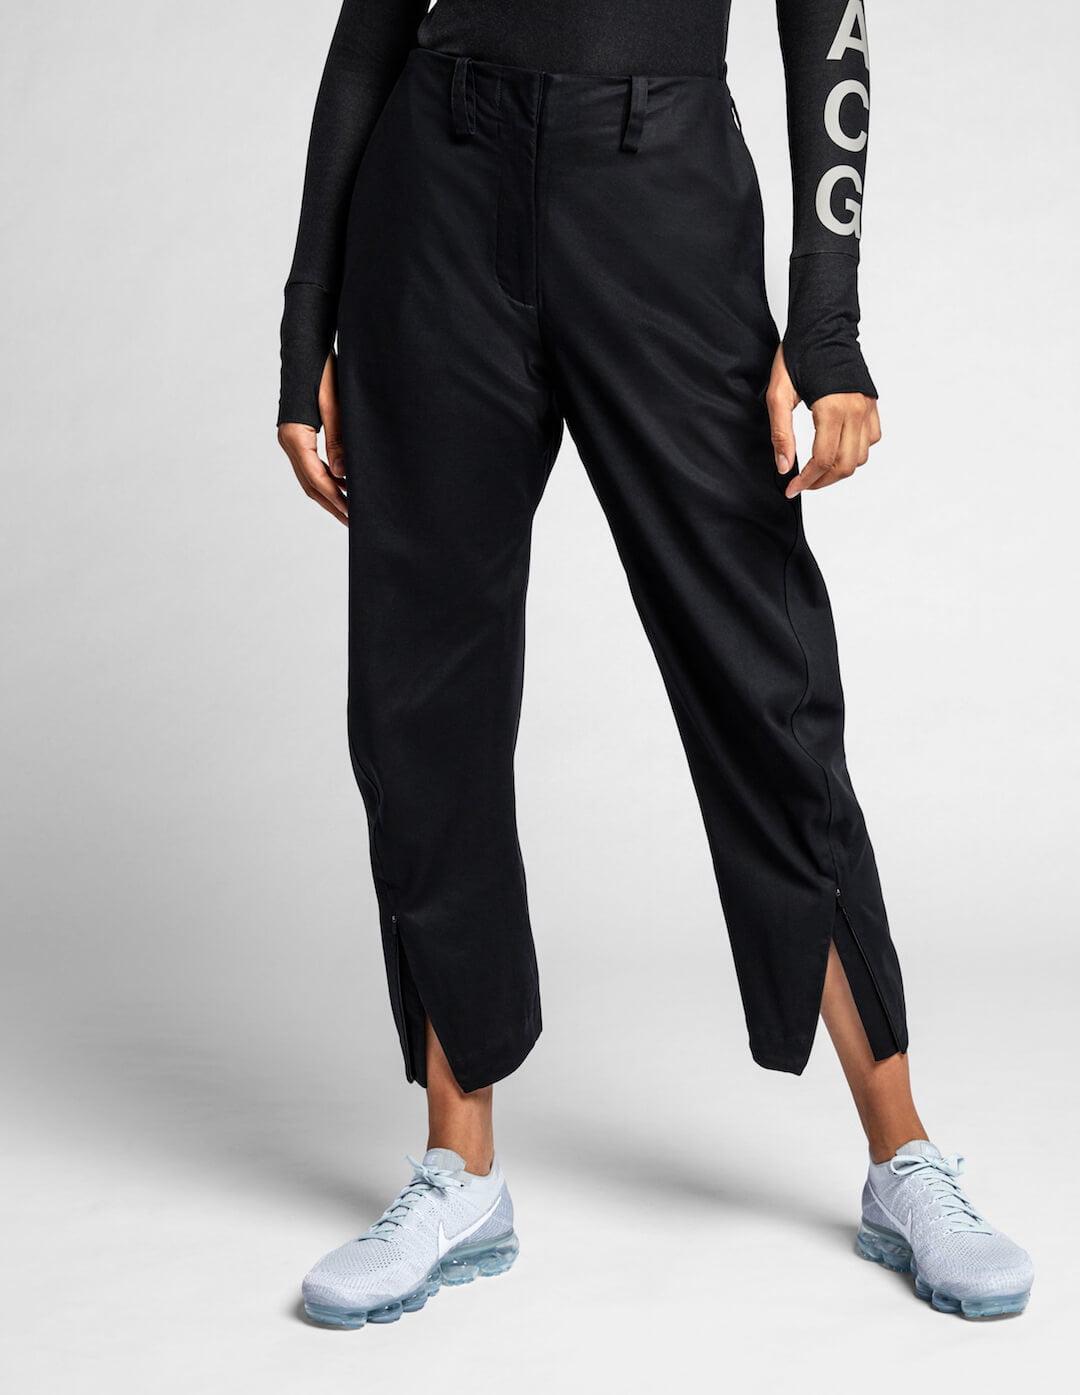 Nike-ACG-Collection-6_original